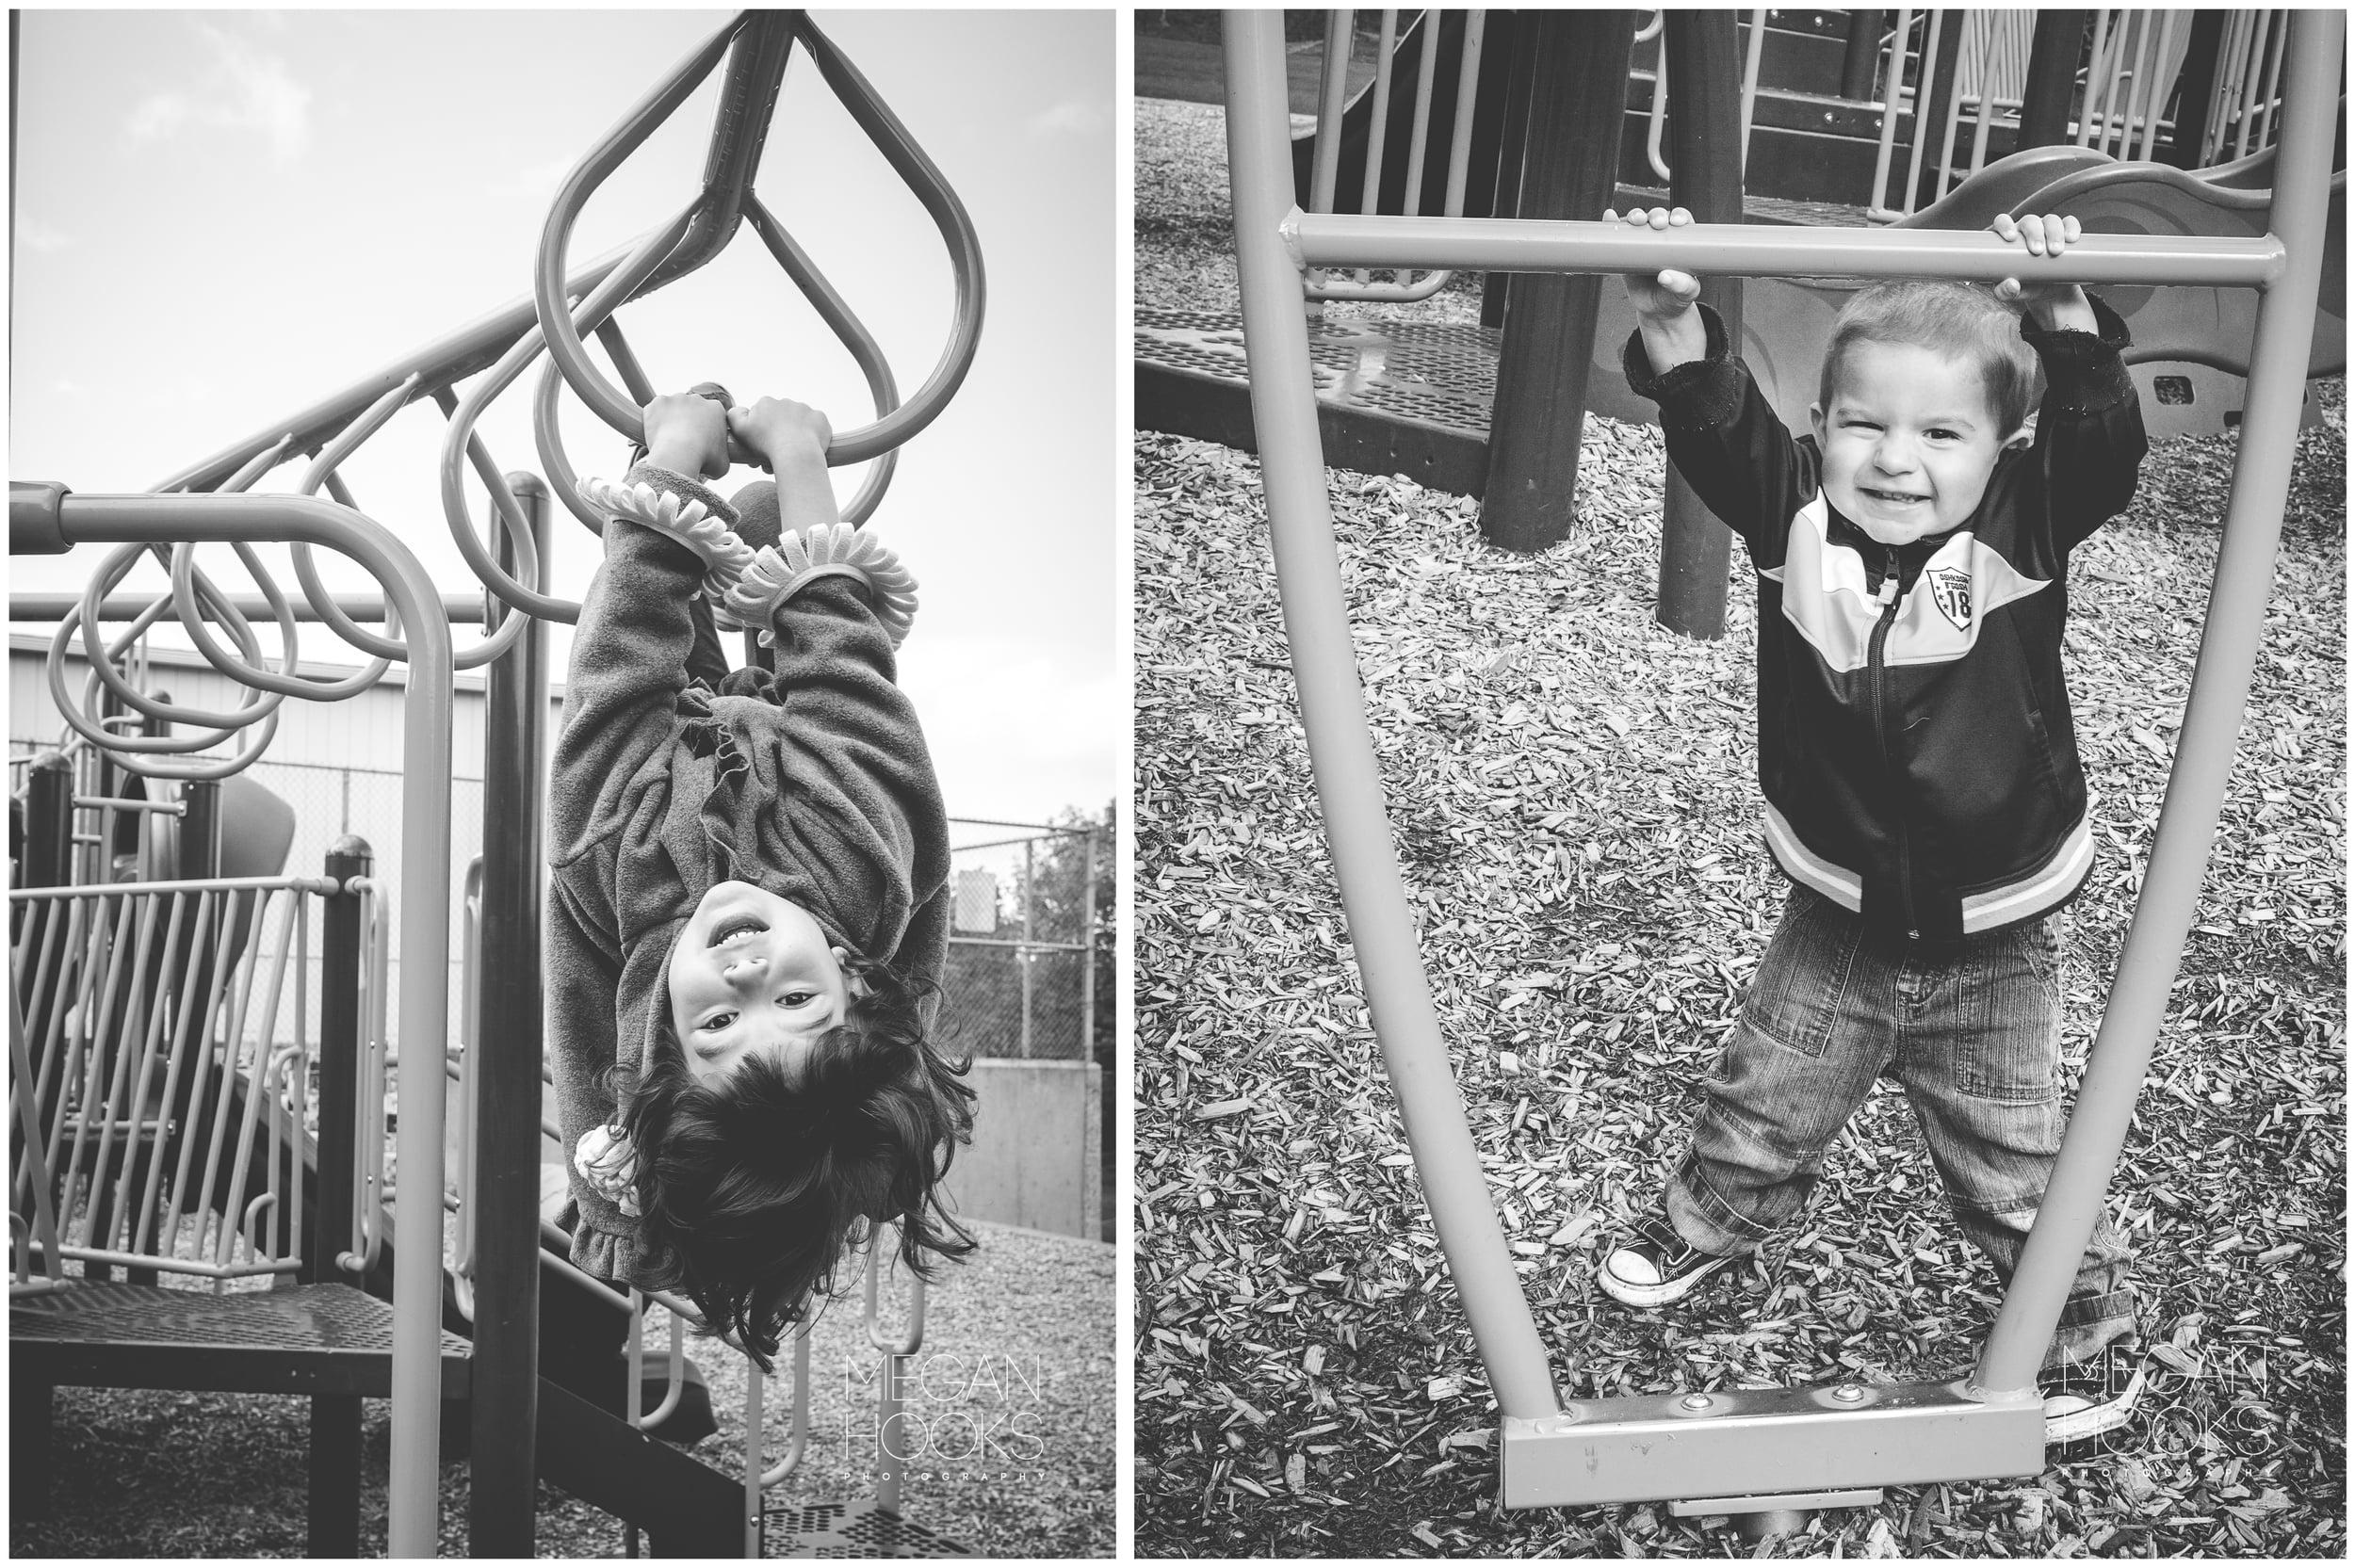 dossantos playground